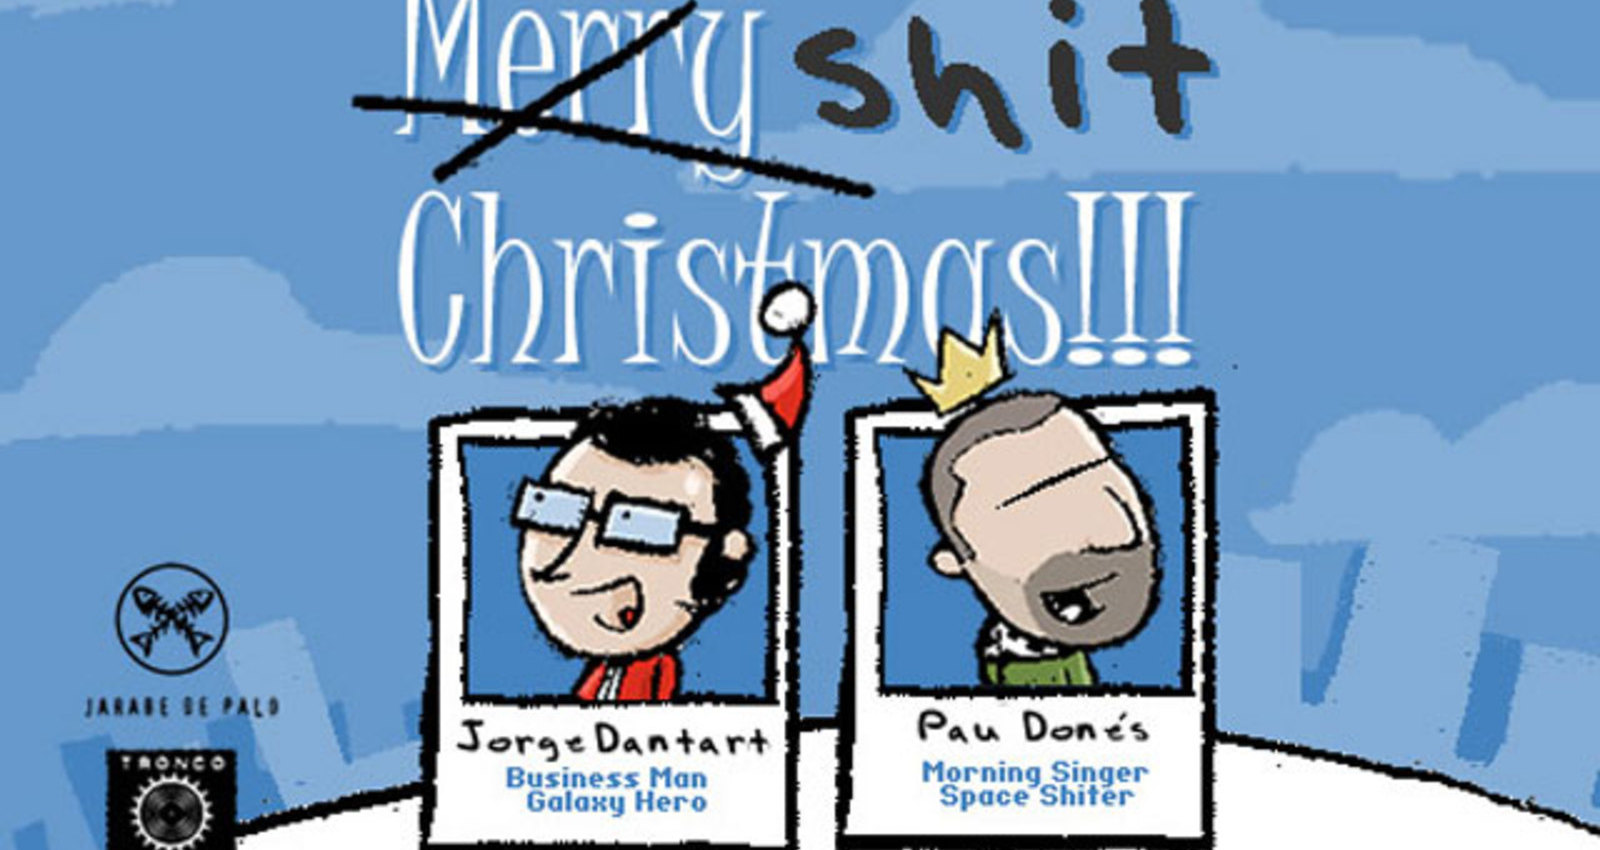 Jarabe de palo Christmas